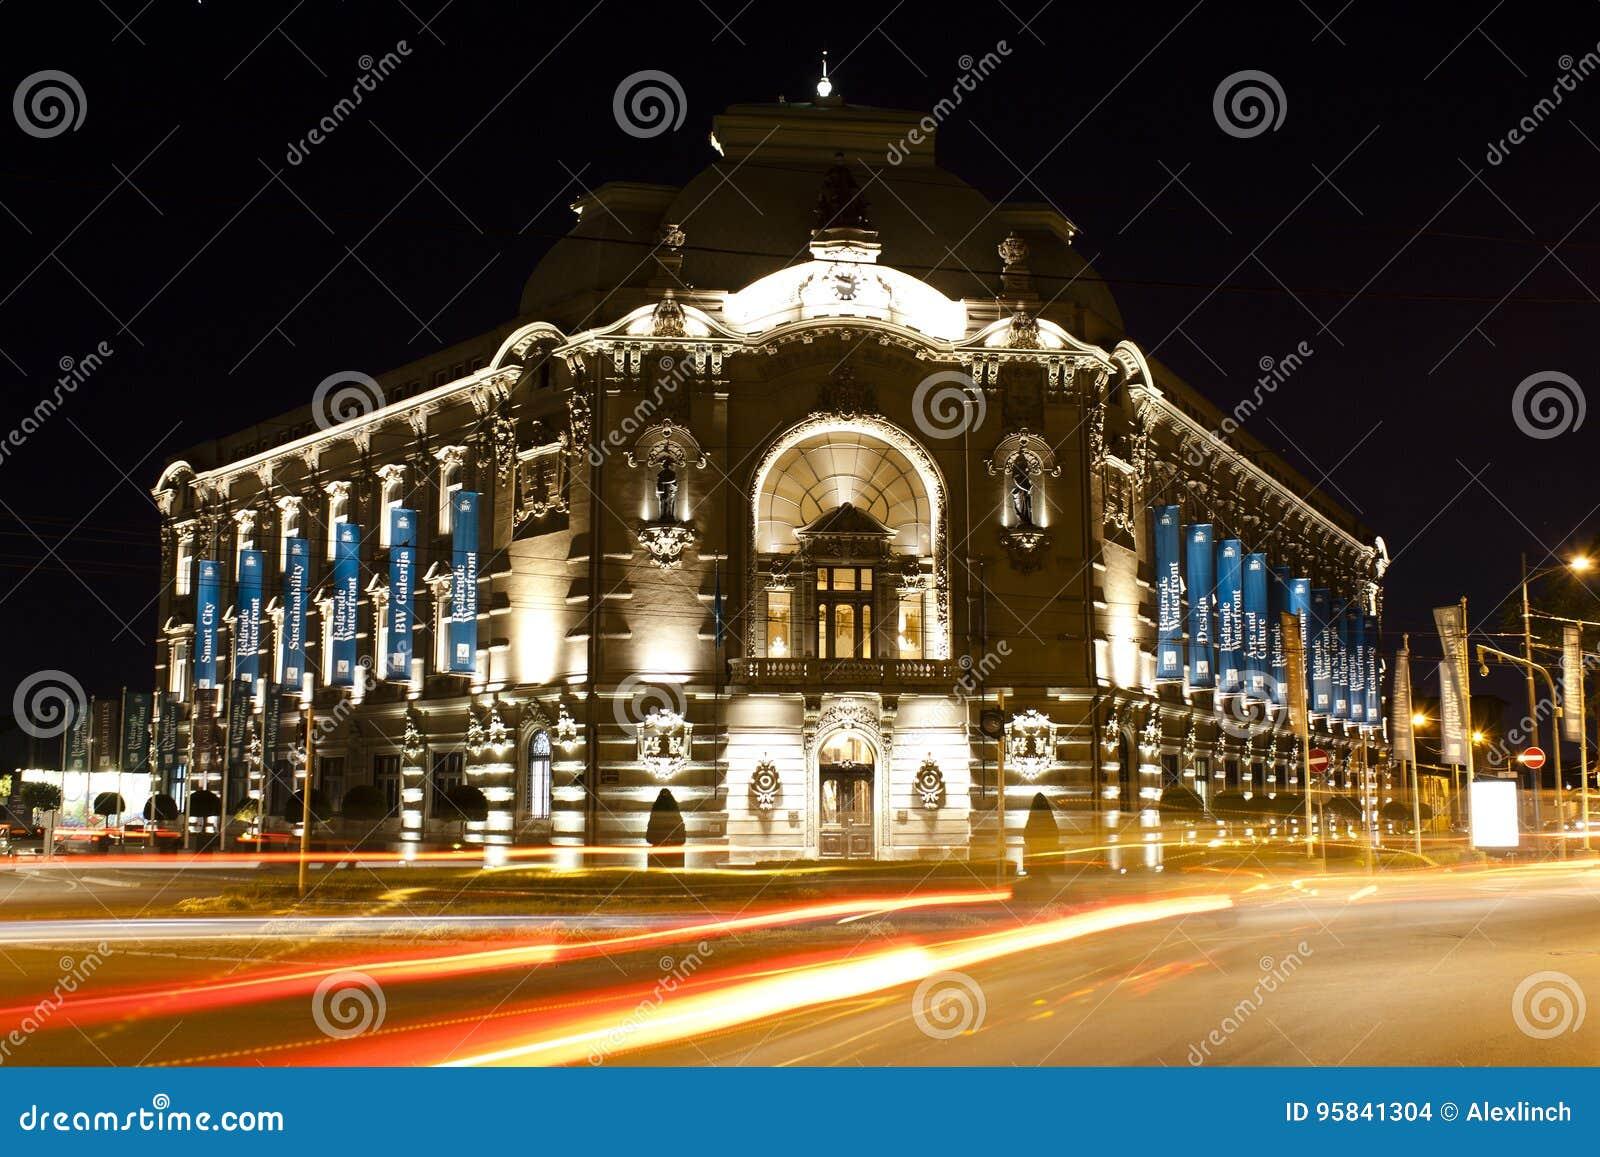 The Geozavod building in Belgrade, Serbia